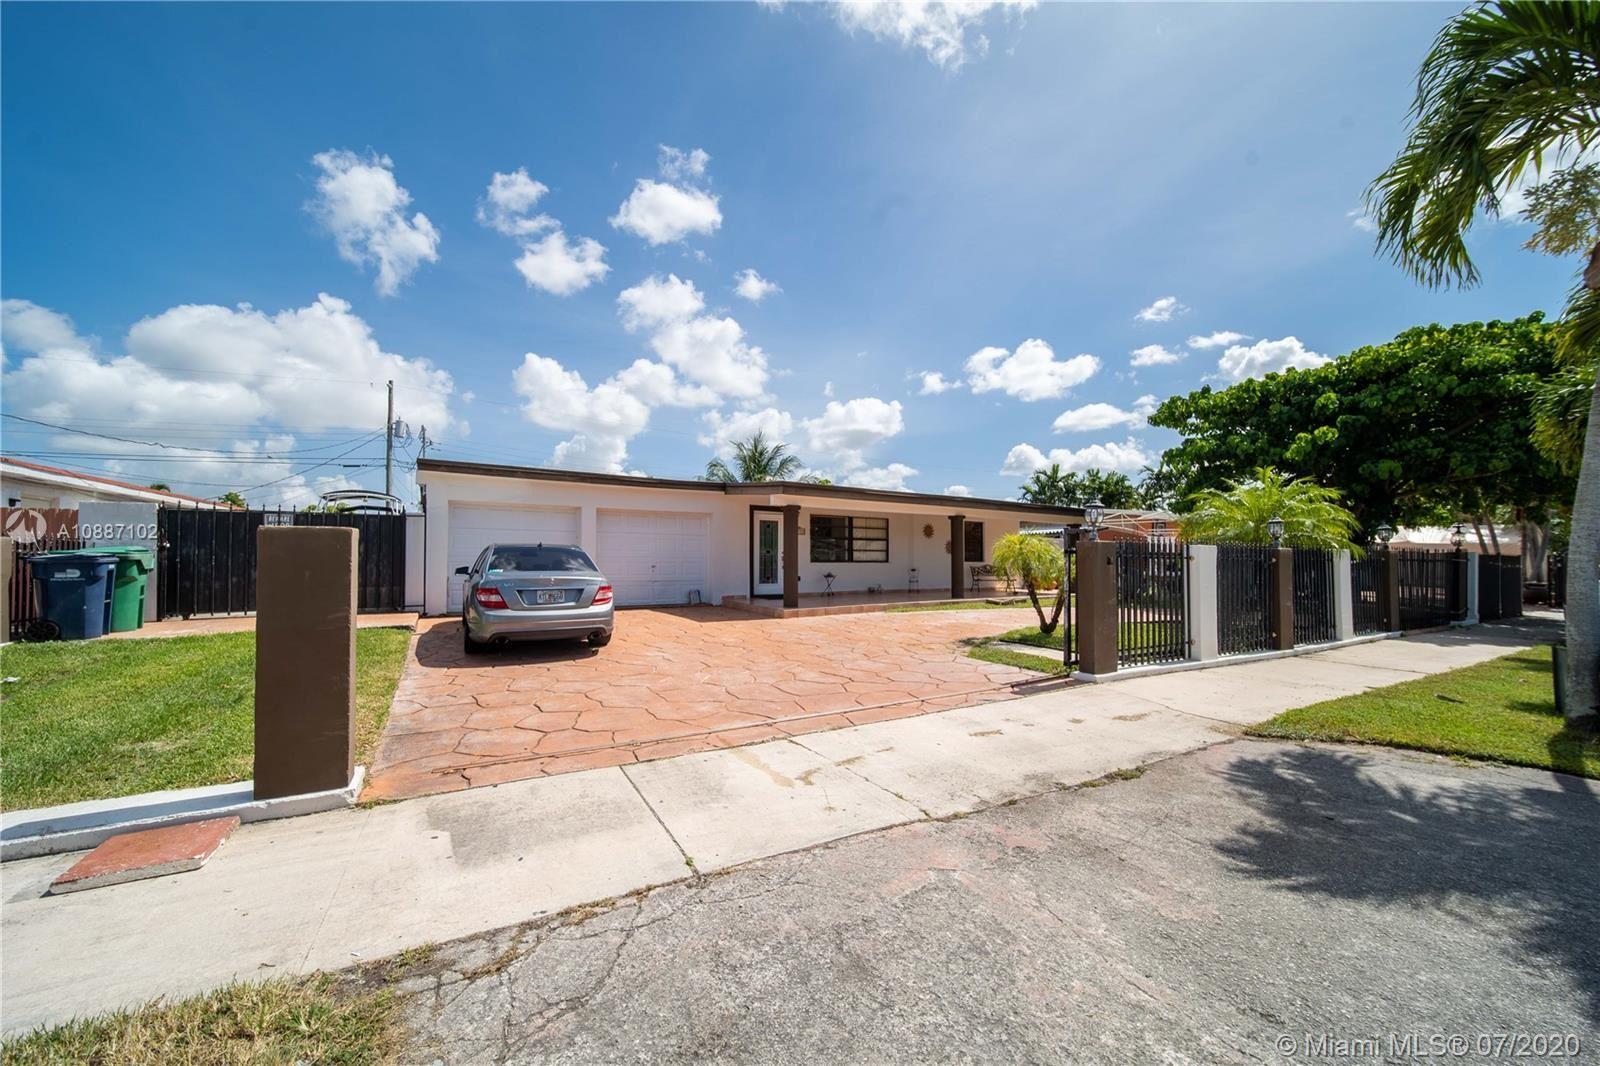 11401 SW 52nd Ter, Miami, FL 33165 - #: A10887102